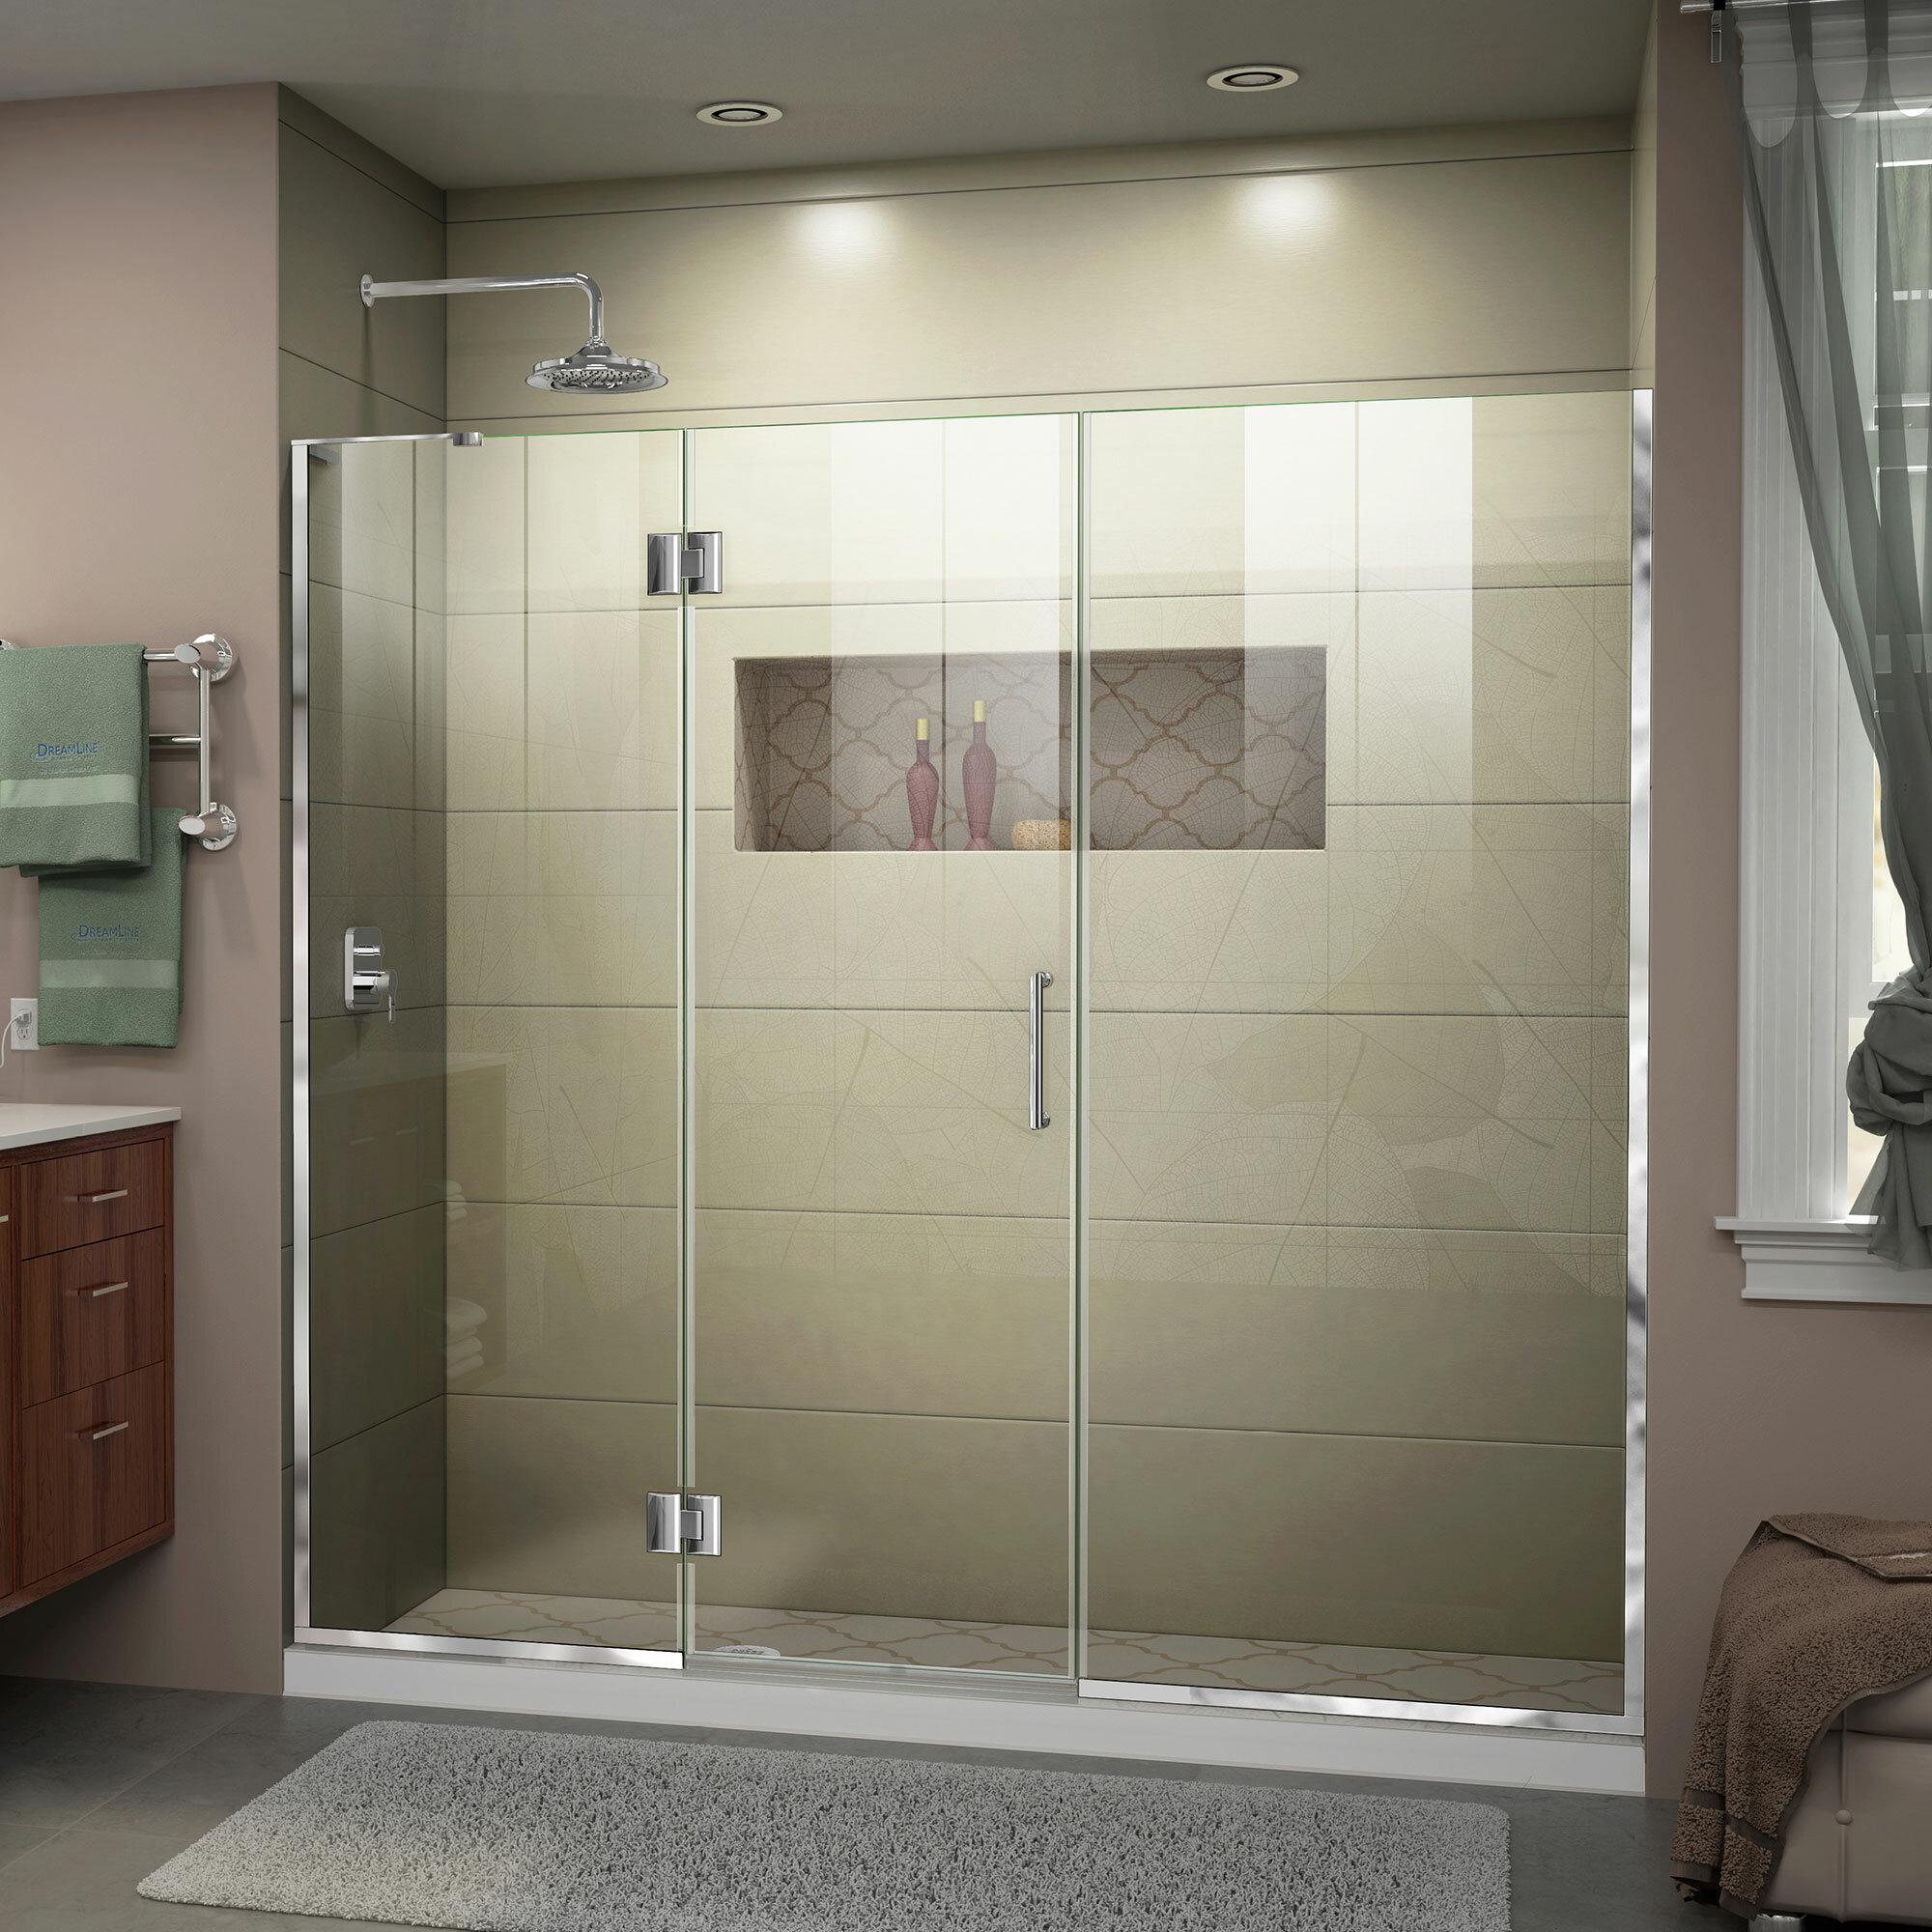 Dreamline Unidoor X 64 W X 72 H Hinged Frameless Shower Door With Clearmax Technology Wayfair